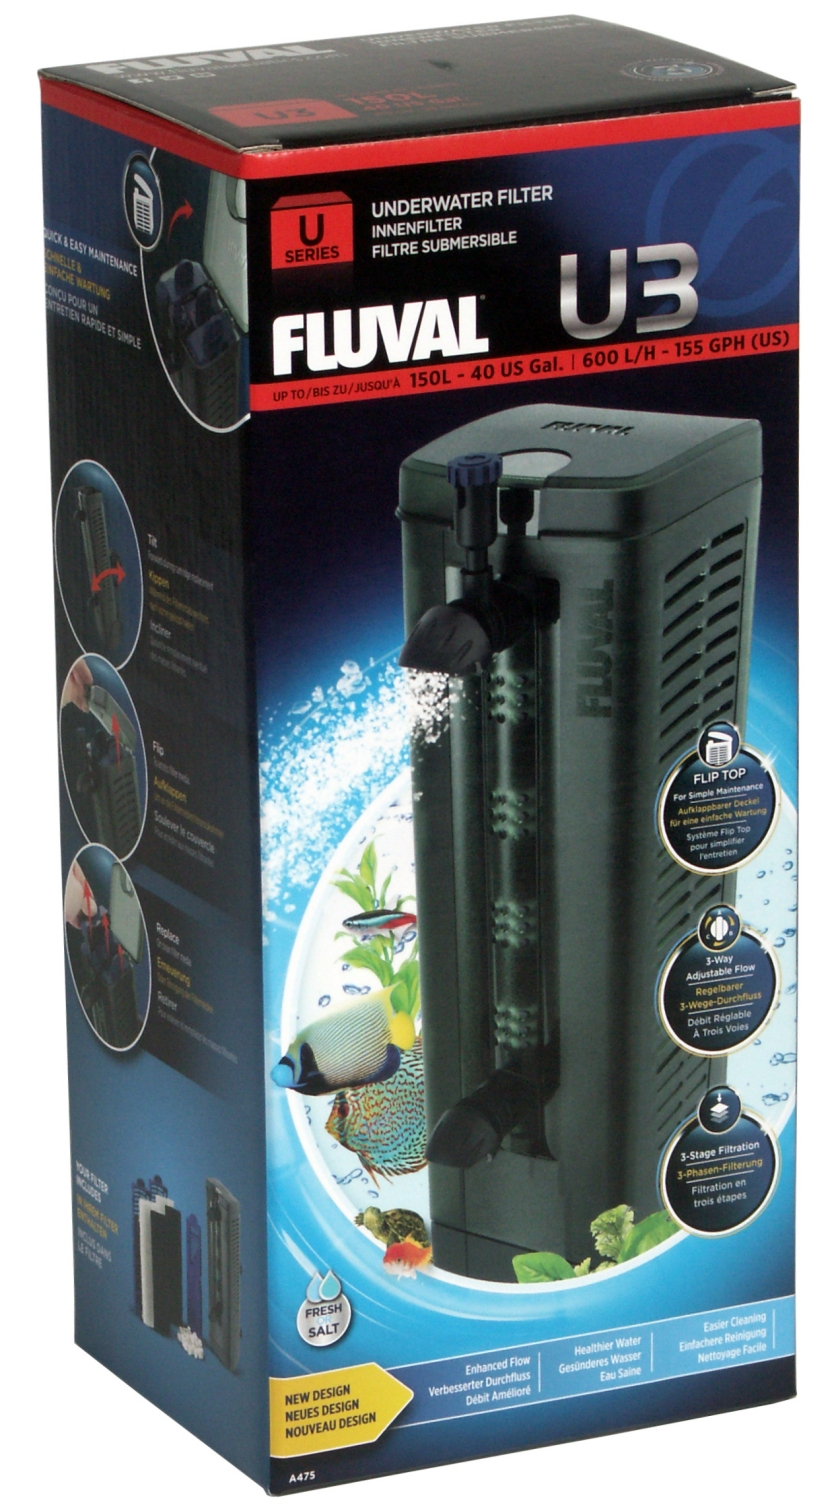 Fluval Aquarium Internal Filter U3